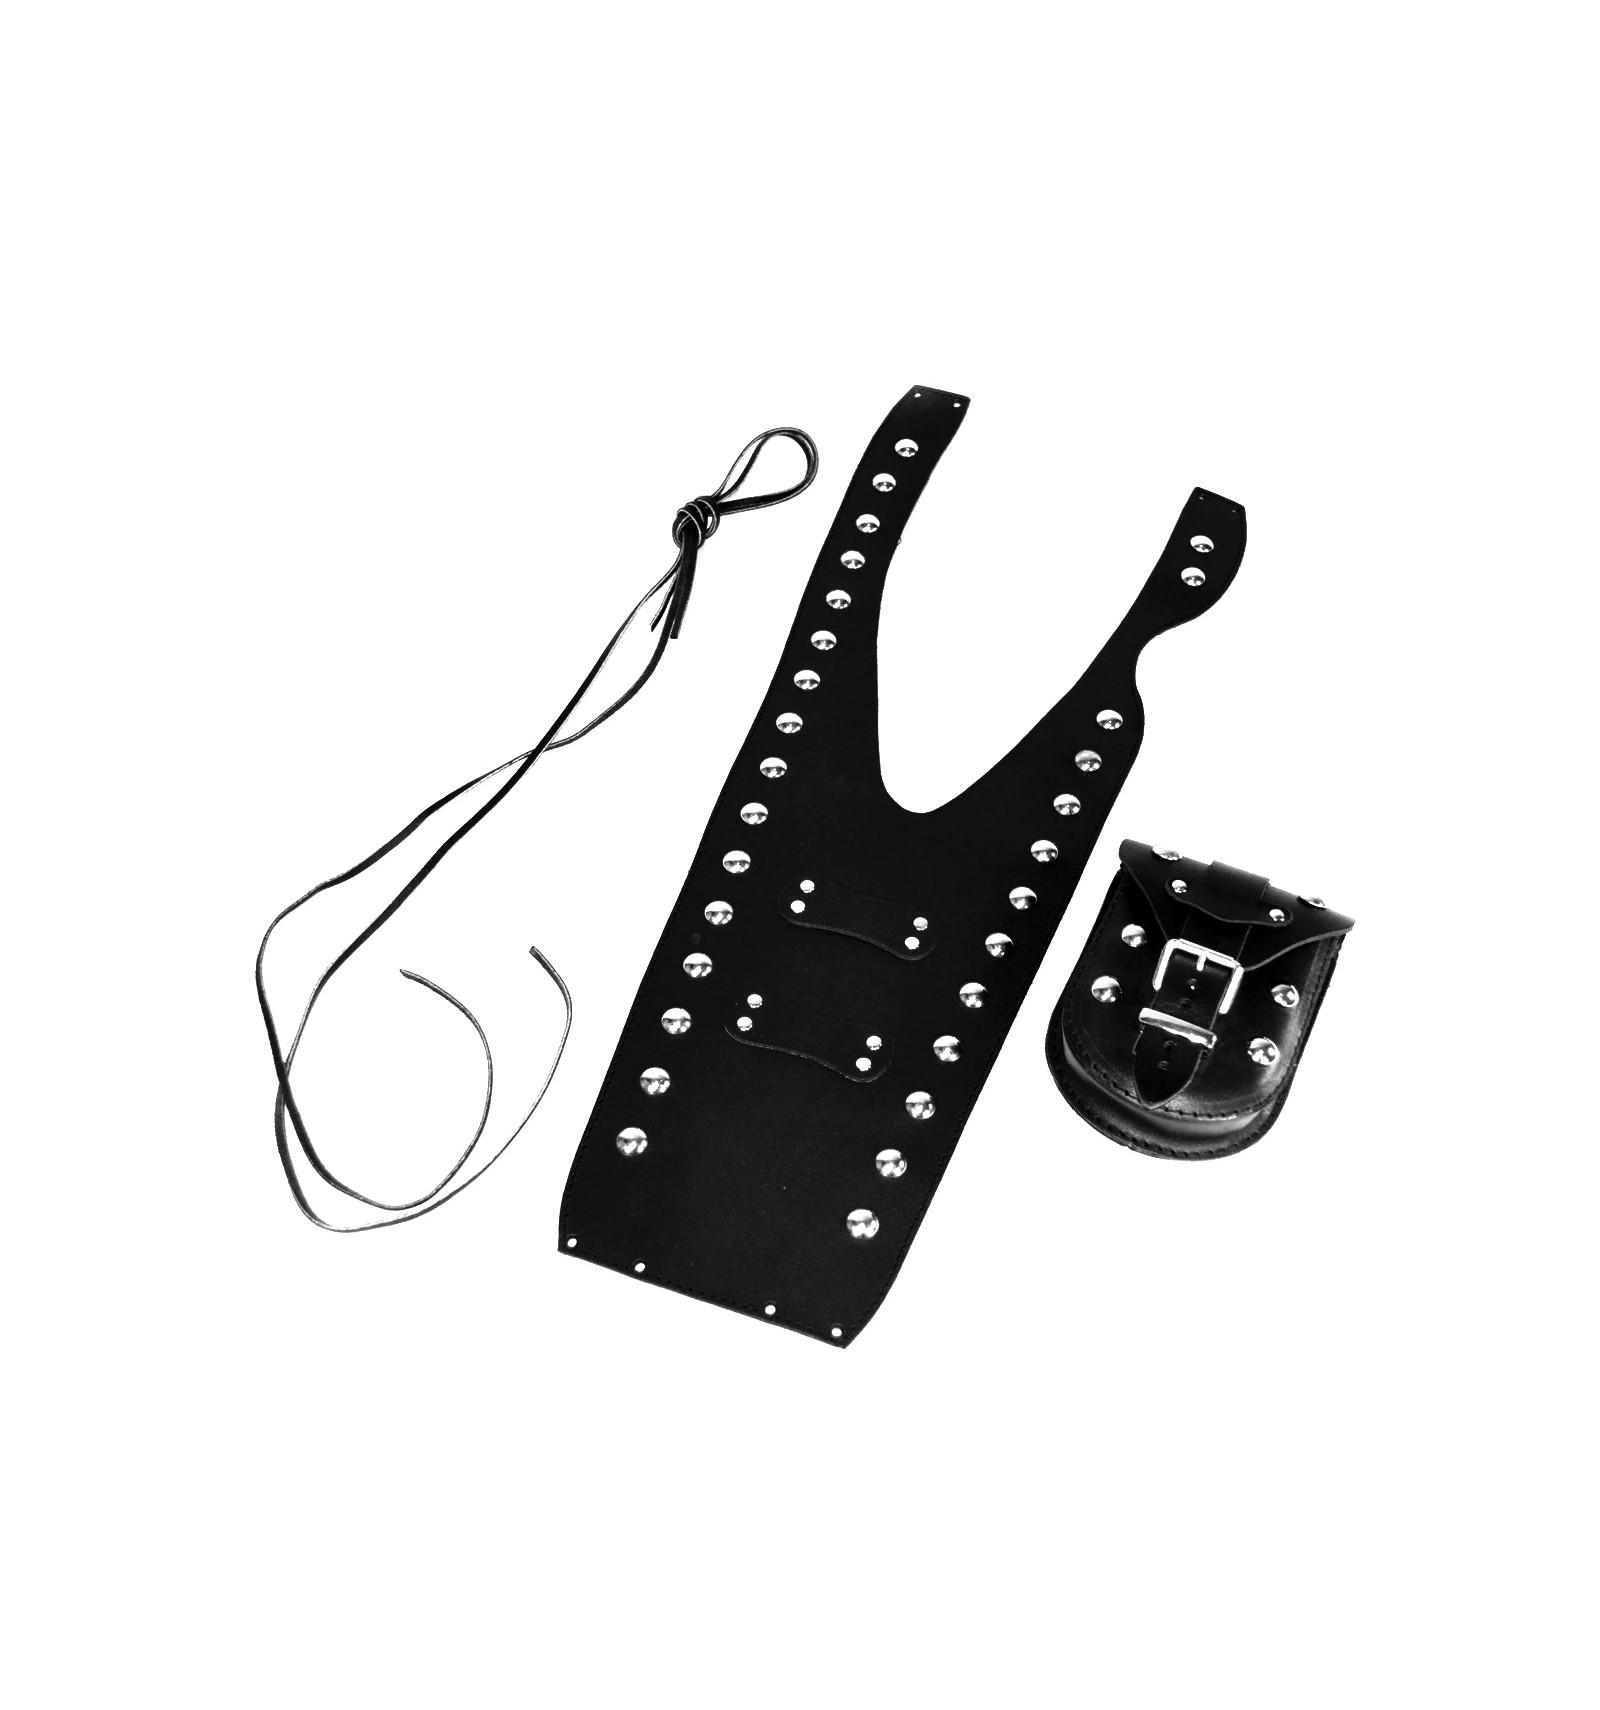 Kit tagliando SCREAMIN EAGLE BUELL XB9 XB12 XB12S XB 9 ULYSSES Lightning 1125cr